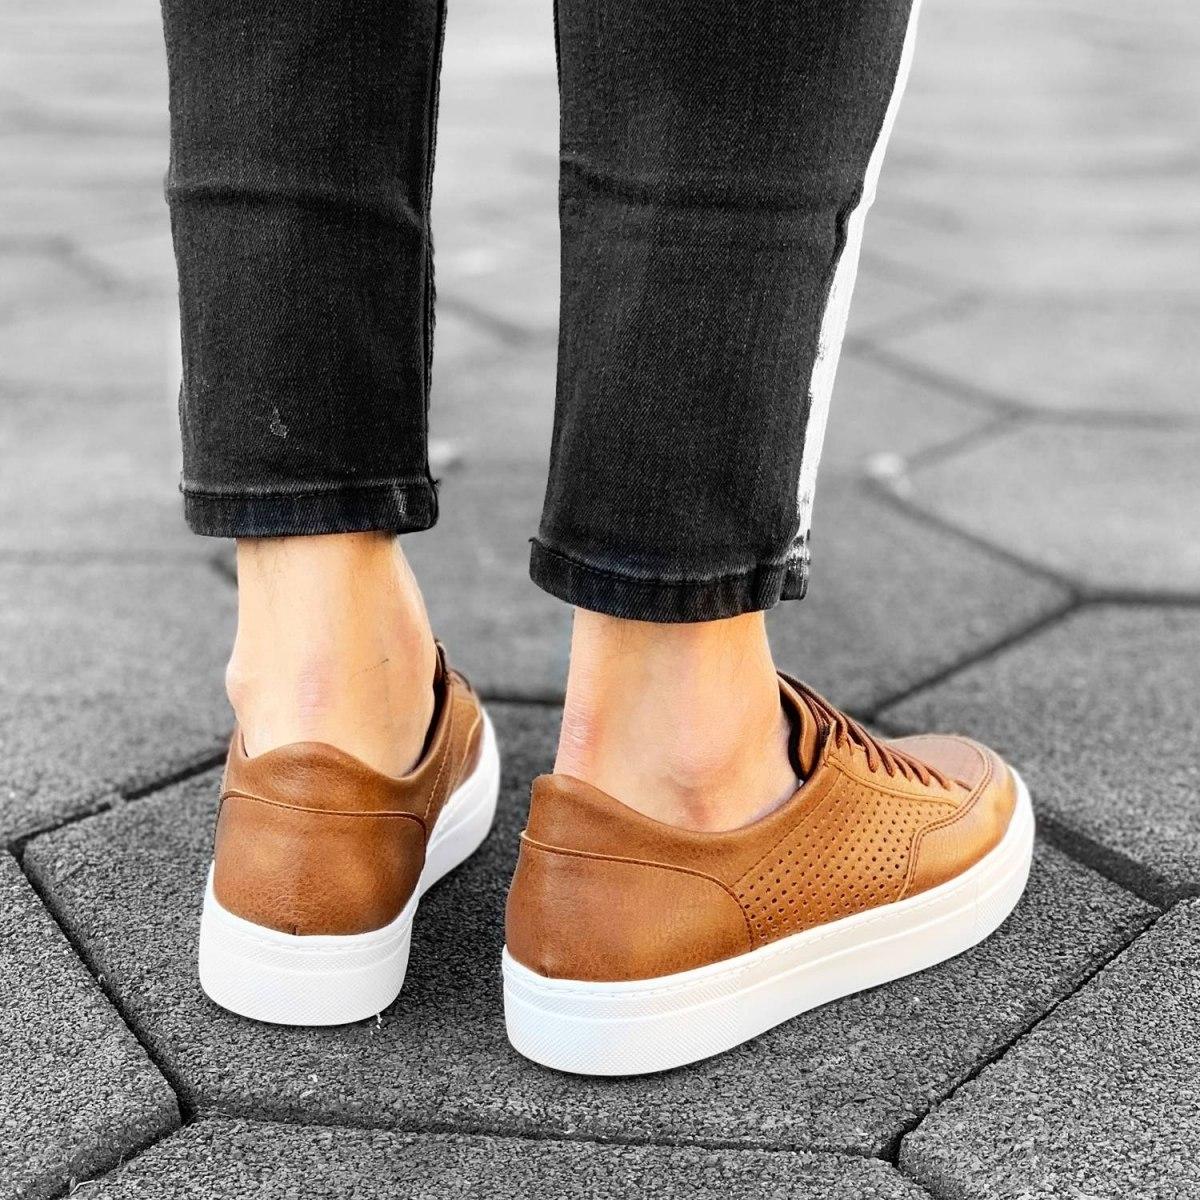 Plexus Sneakers in Tan-White Mv Premium Brand - 2